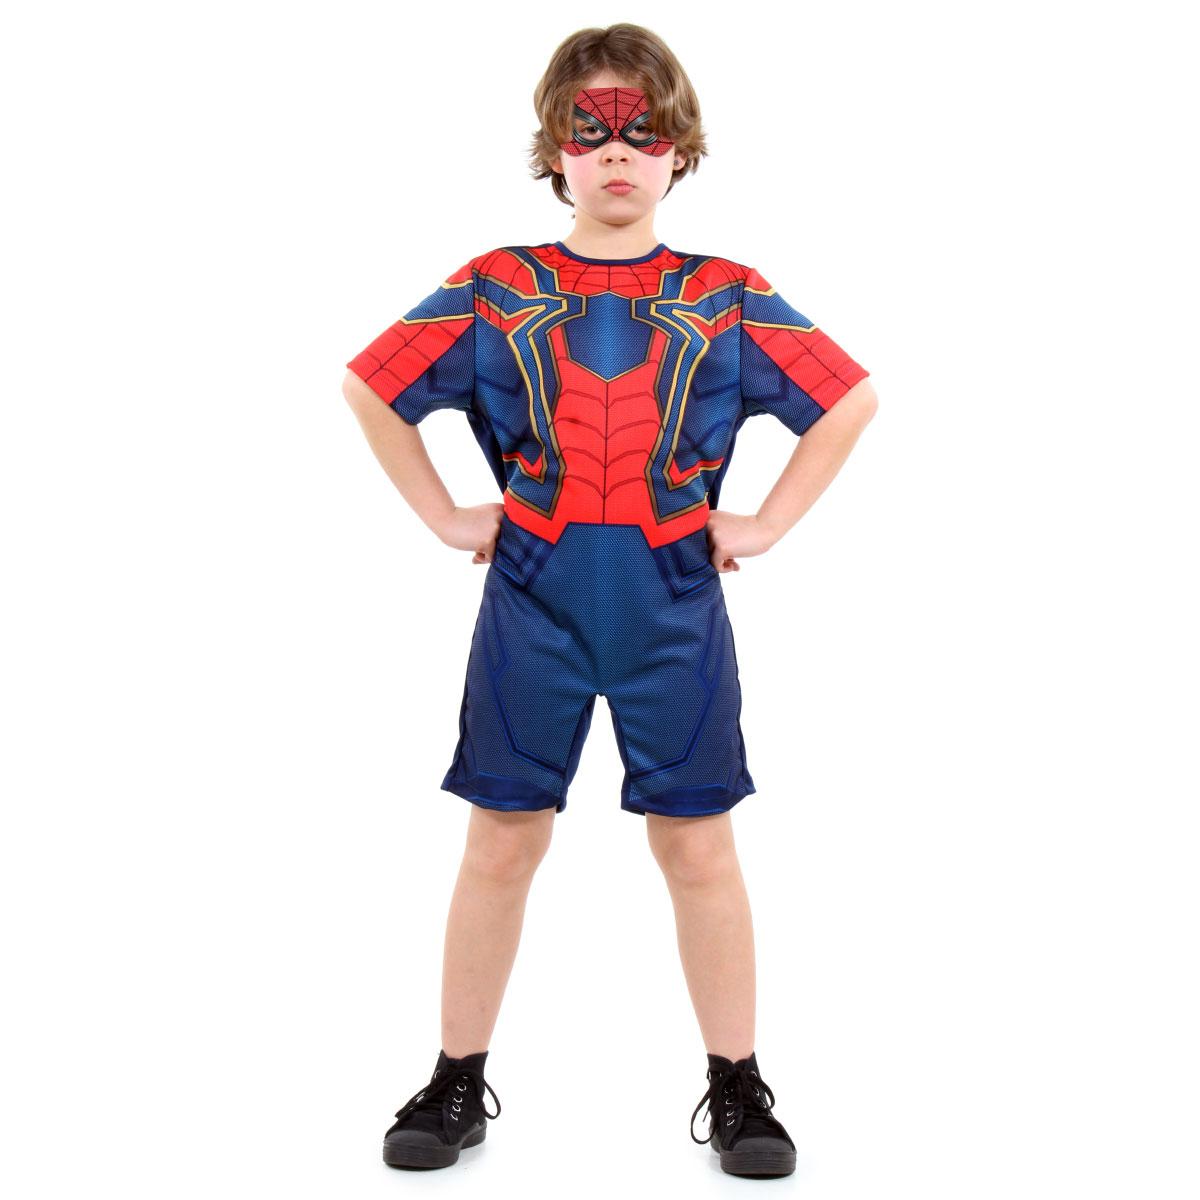 Fantasia Homem Aranha De Ferro Curto - Avengers - Marvel - Abrakadabra